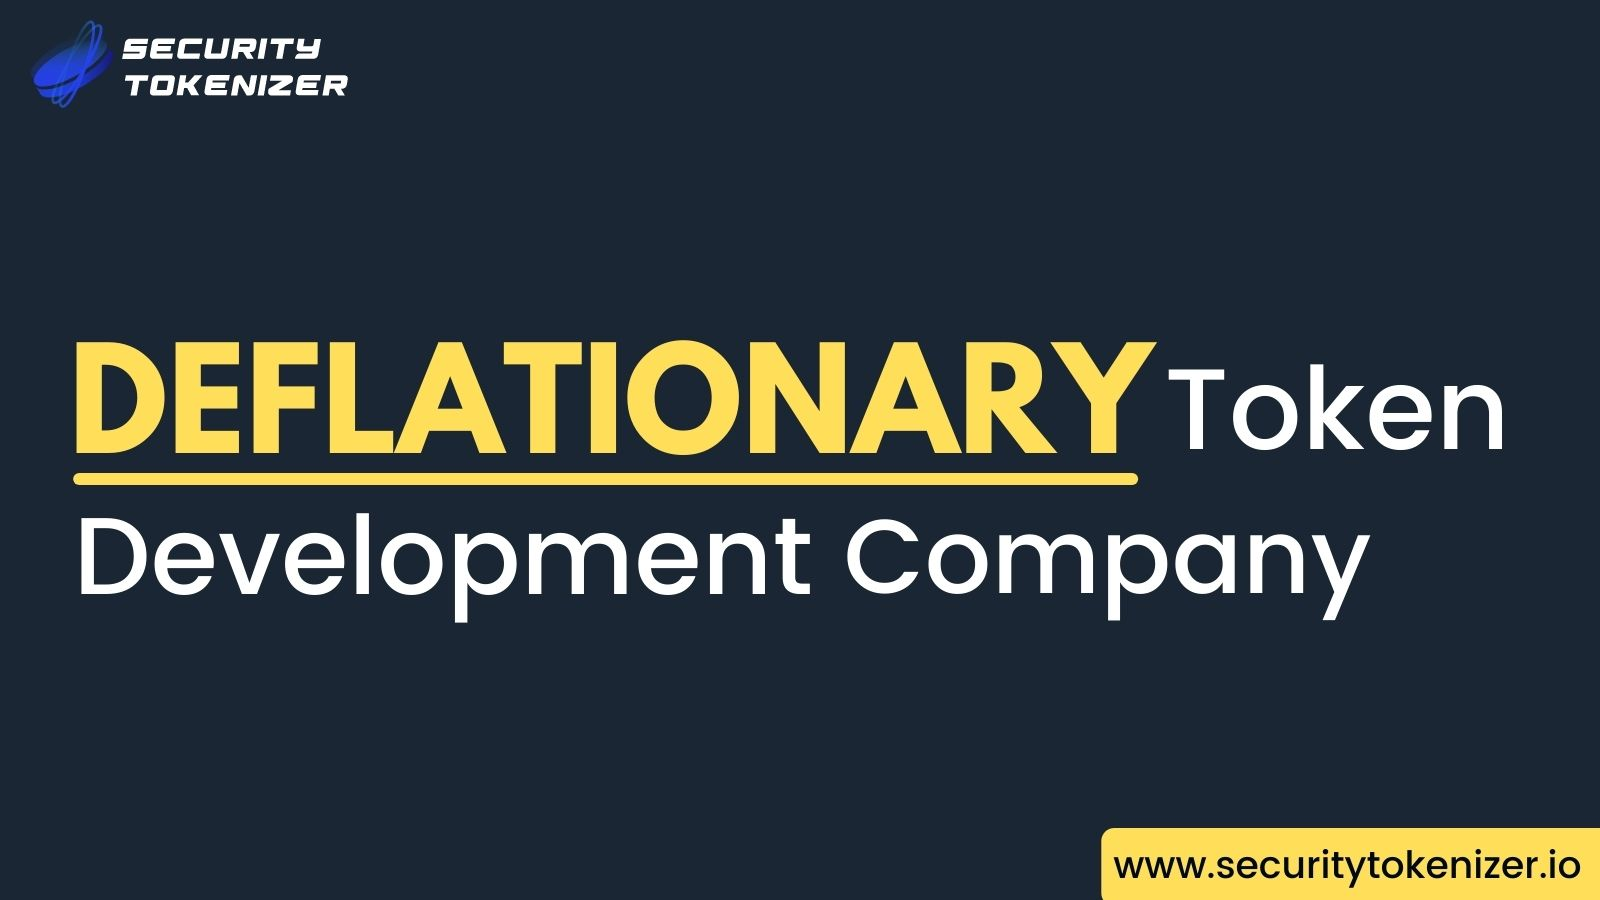 Deflationary Token Development Company